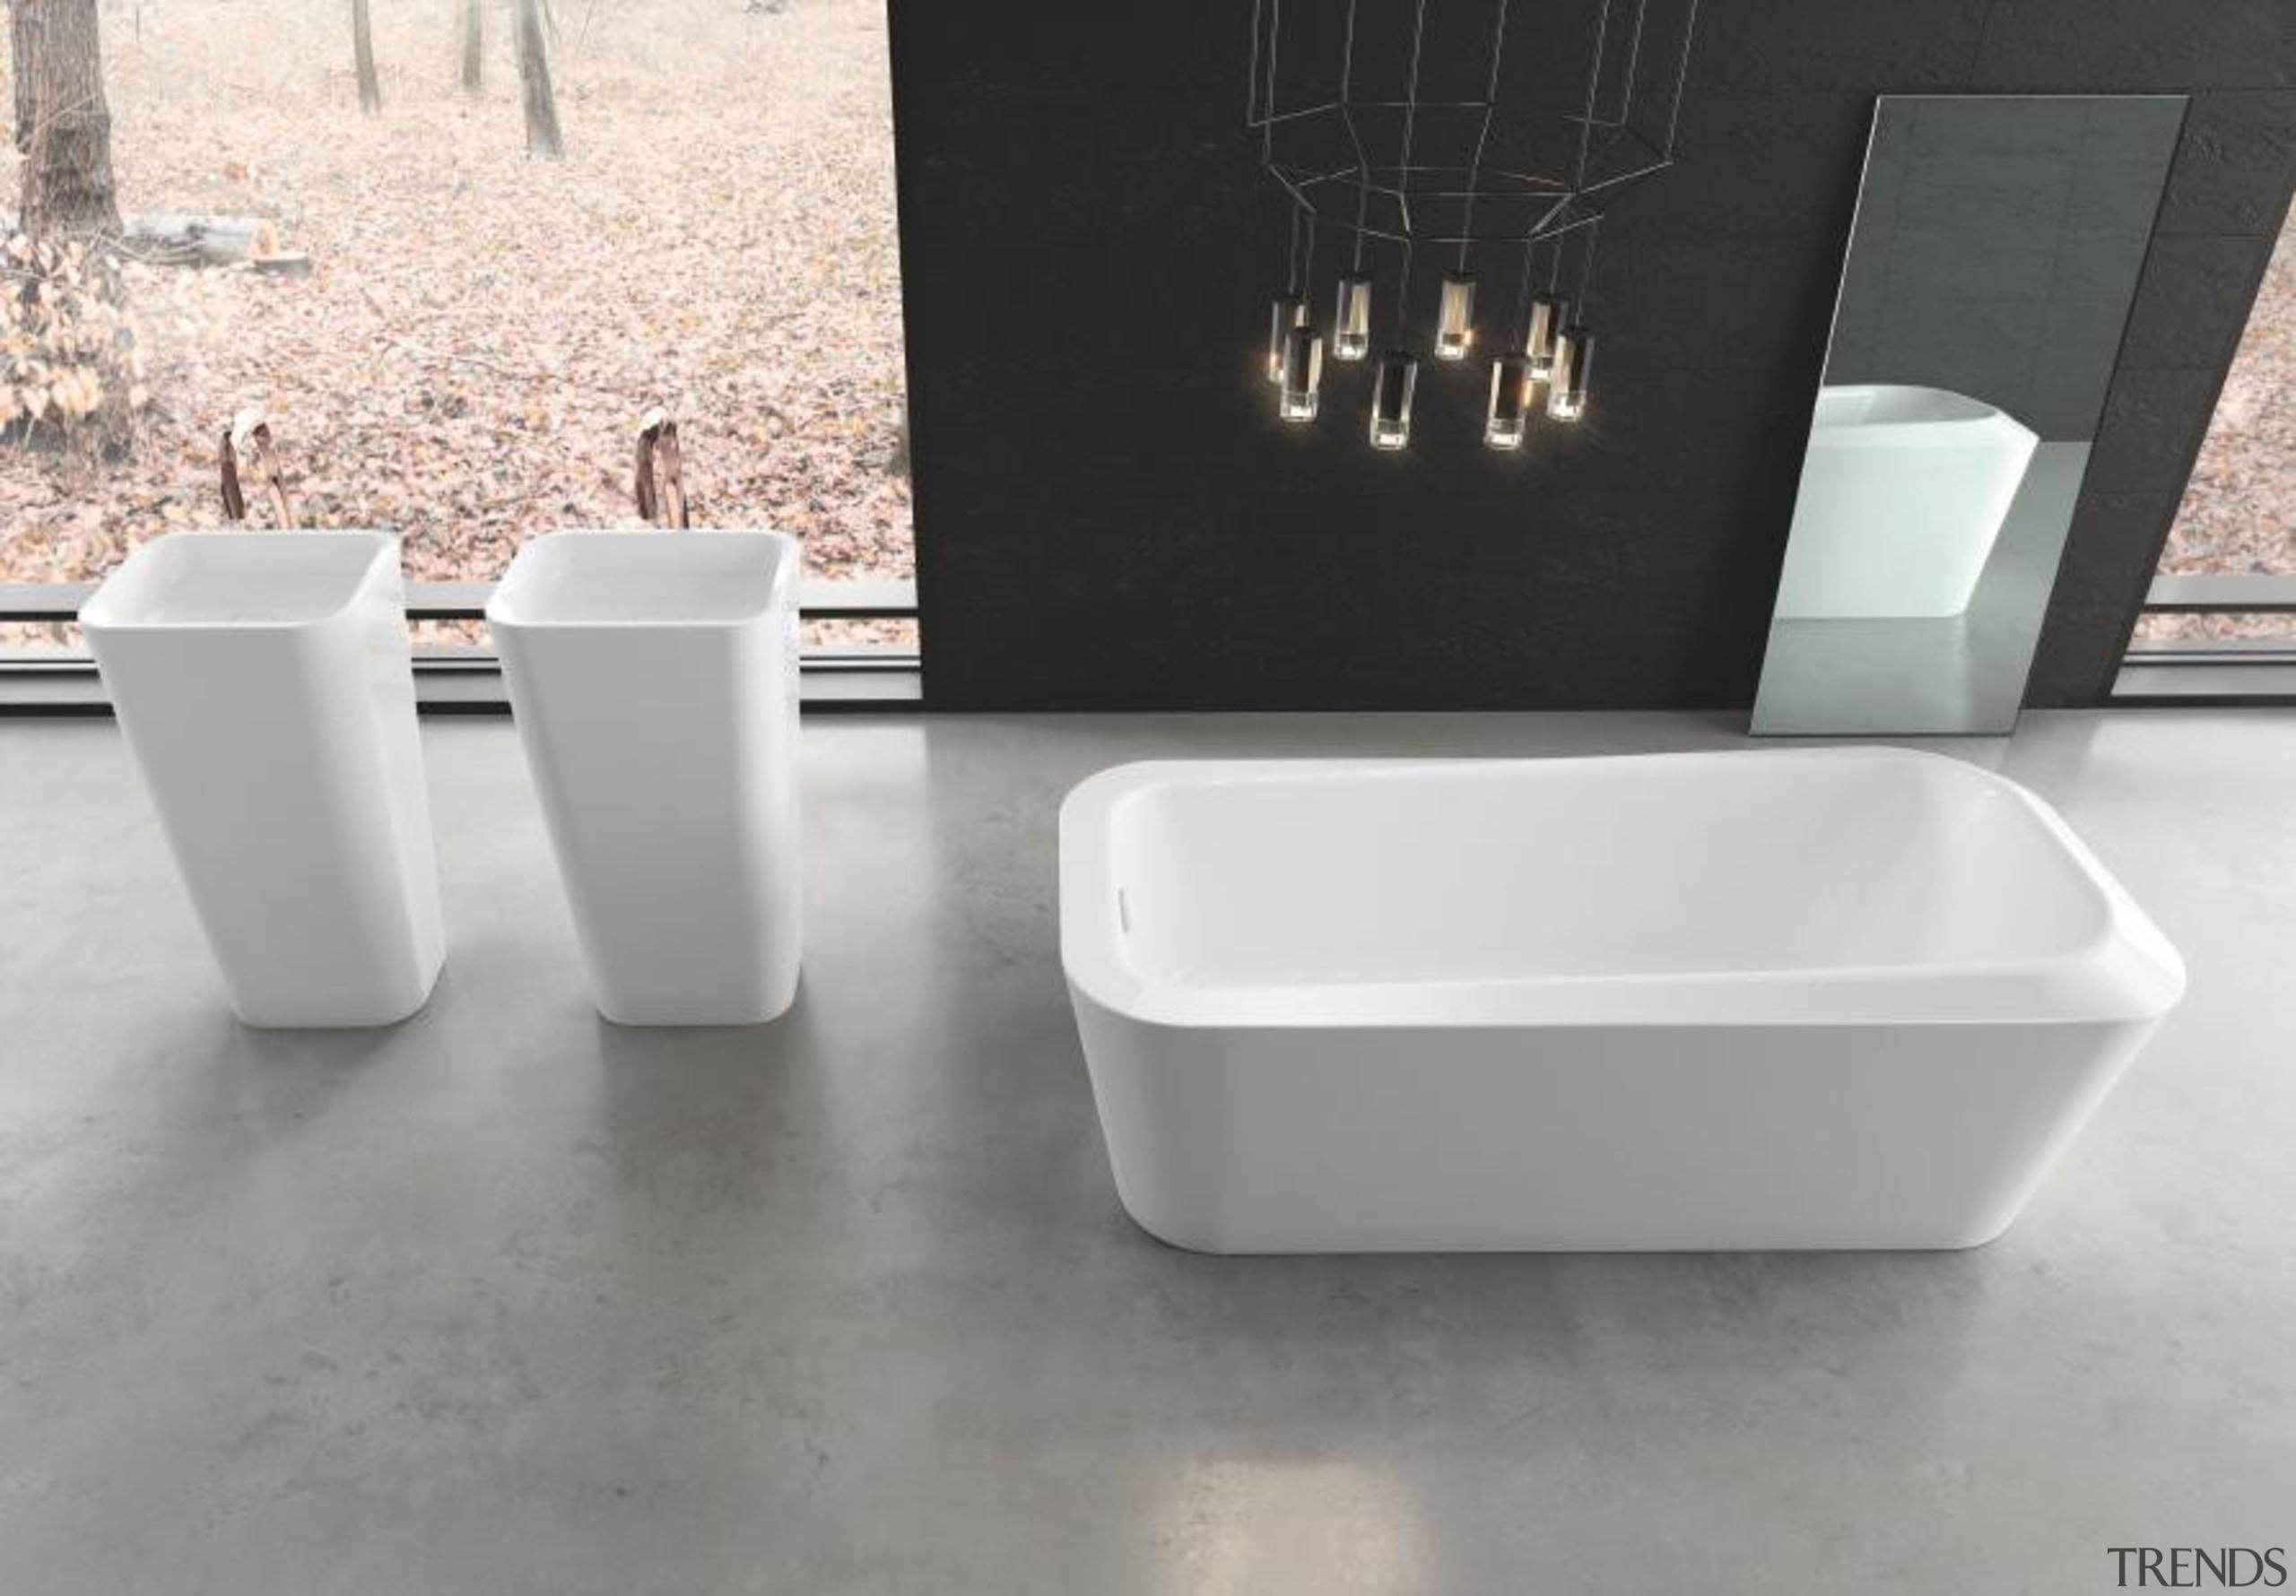 Working with star designer Arik Levy, Kaldewei has bathroom sink, bathtub, ceramic, plumbing fixture, product, product design, sink, tap, gray, white